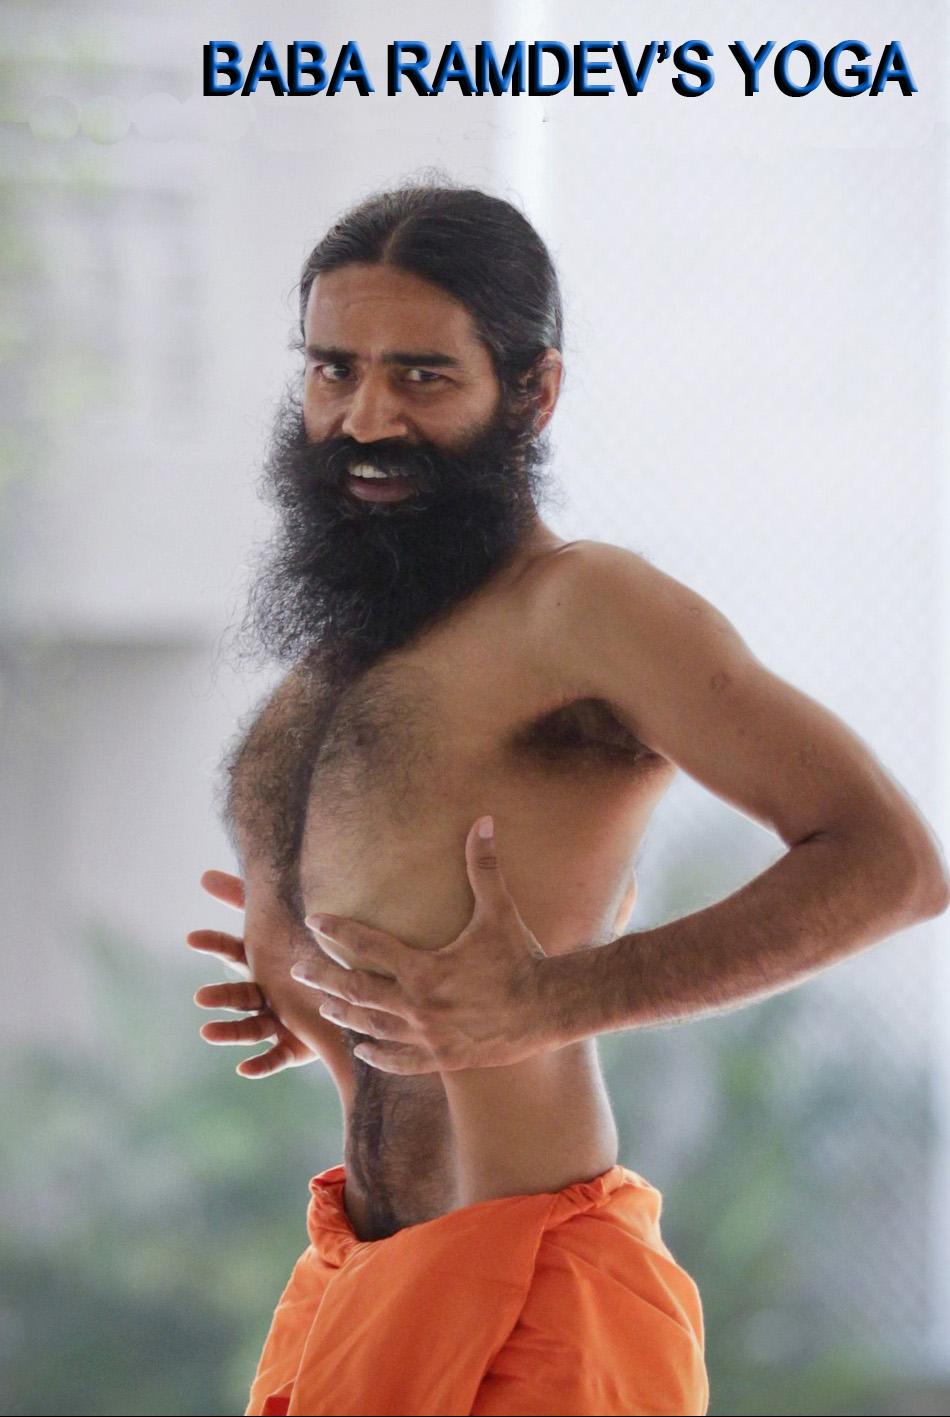 yoga for asthma by baba ramdev hindi linksys wrt54gl user manual Linksys WRT54G V8 Installation Software